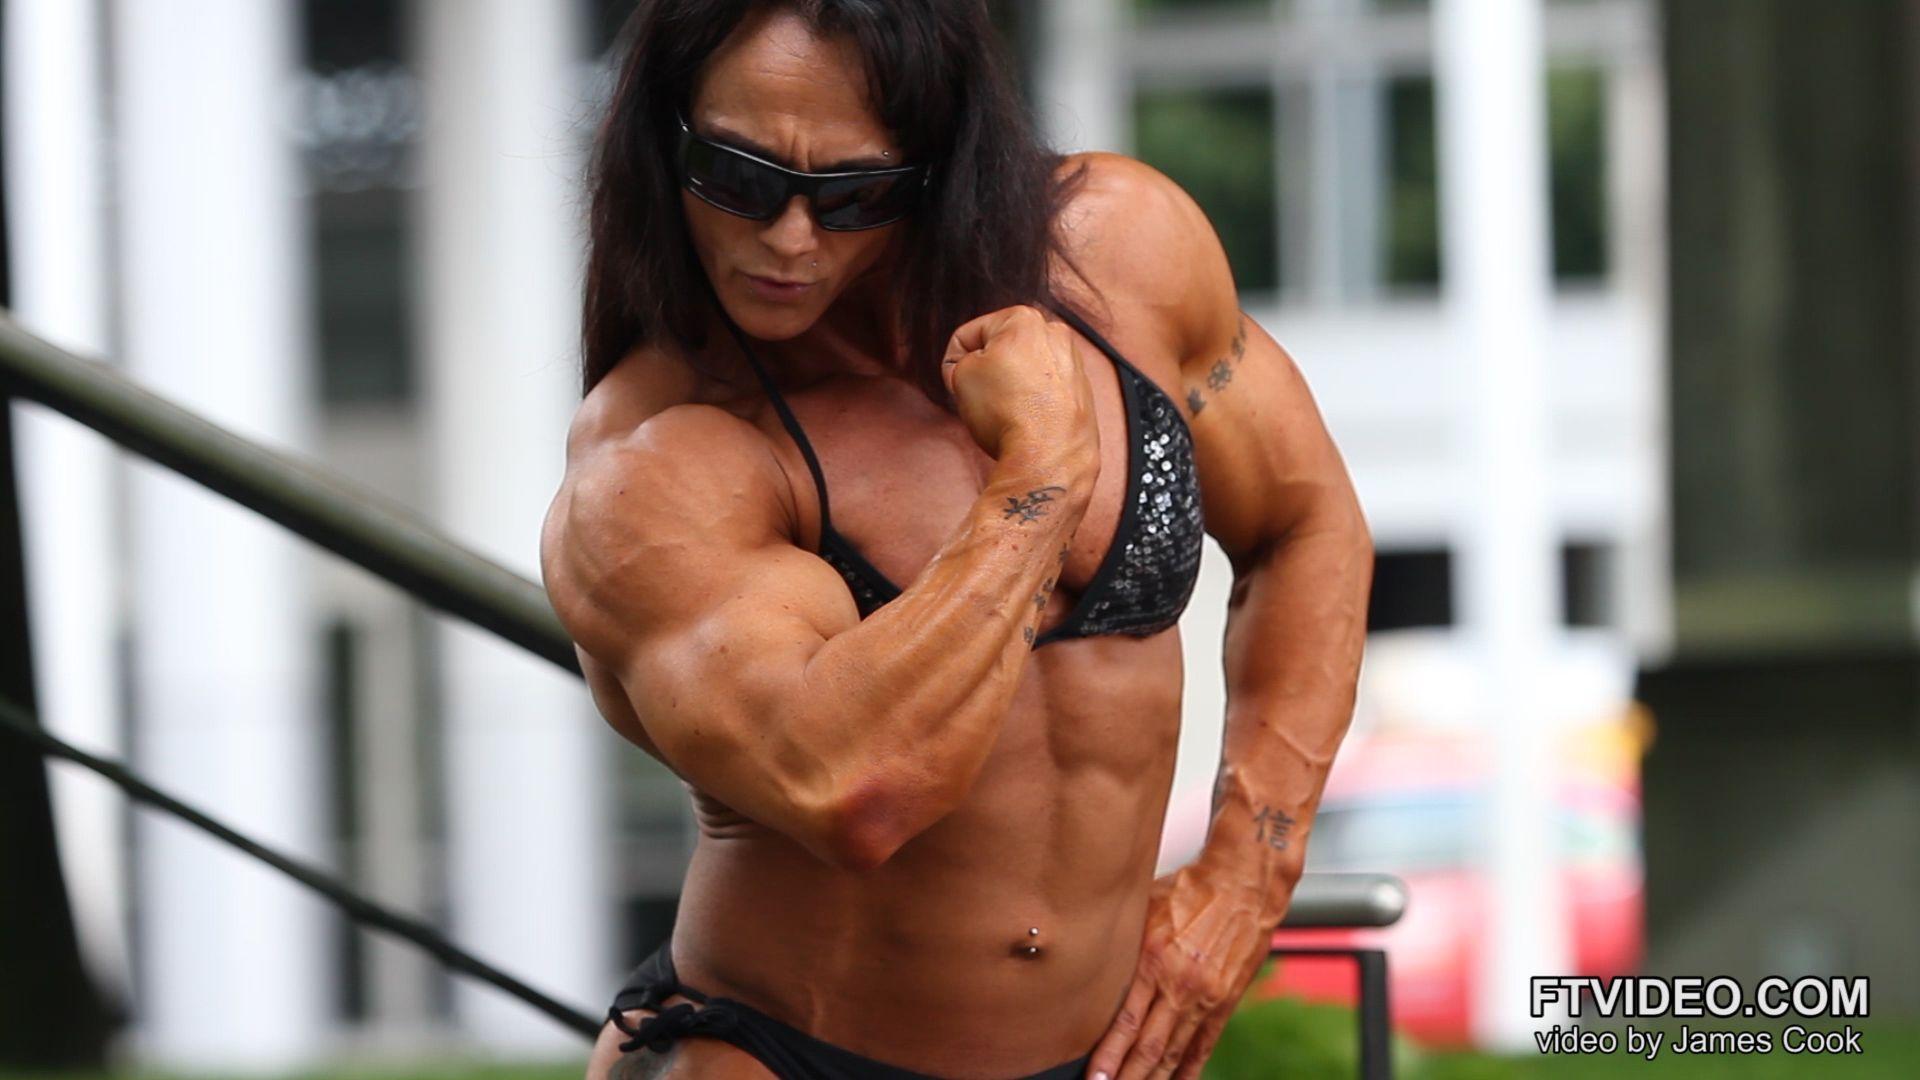 Female body builder video clip